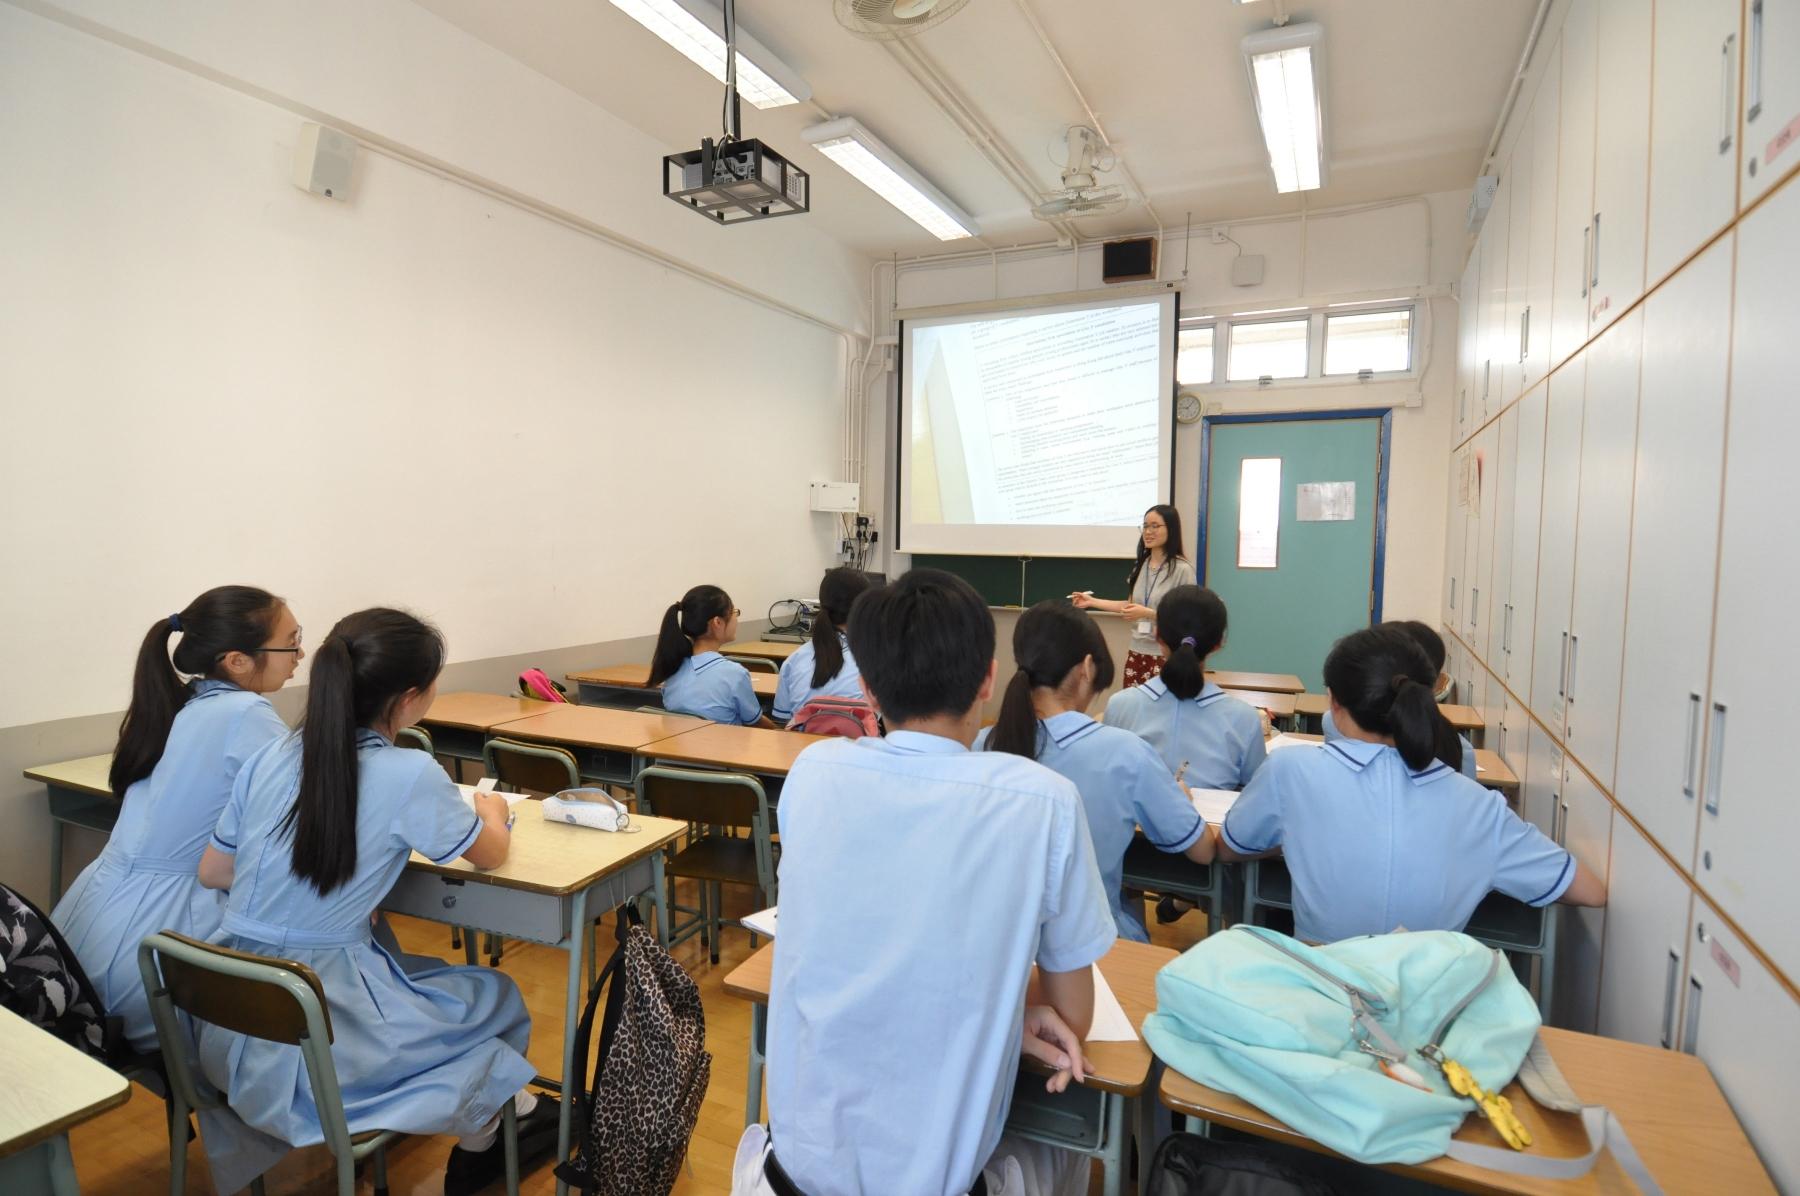 http://npc.edu.hk/sites/default/files/dsc_0005.jpg